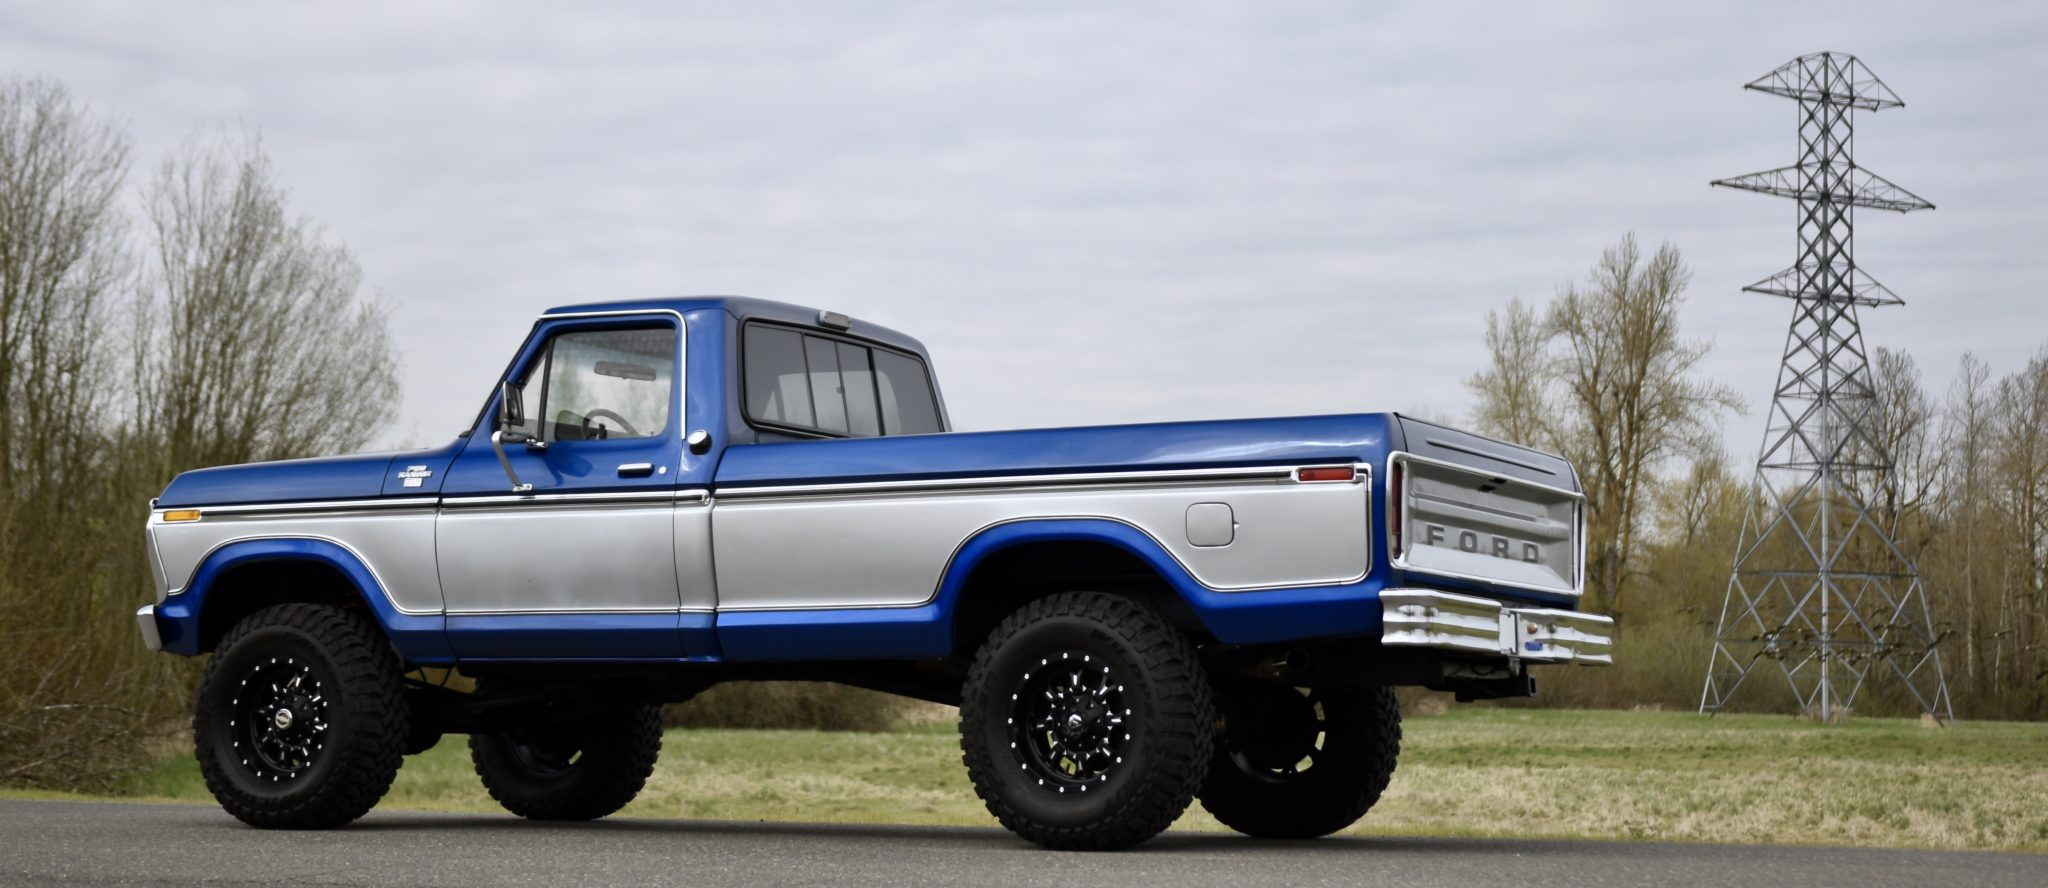 This 1977 Ford F 150 Ranger Xlt Packs A Four Barrel Carbureted 351 Cleveland V8 Autoevolution